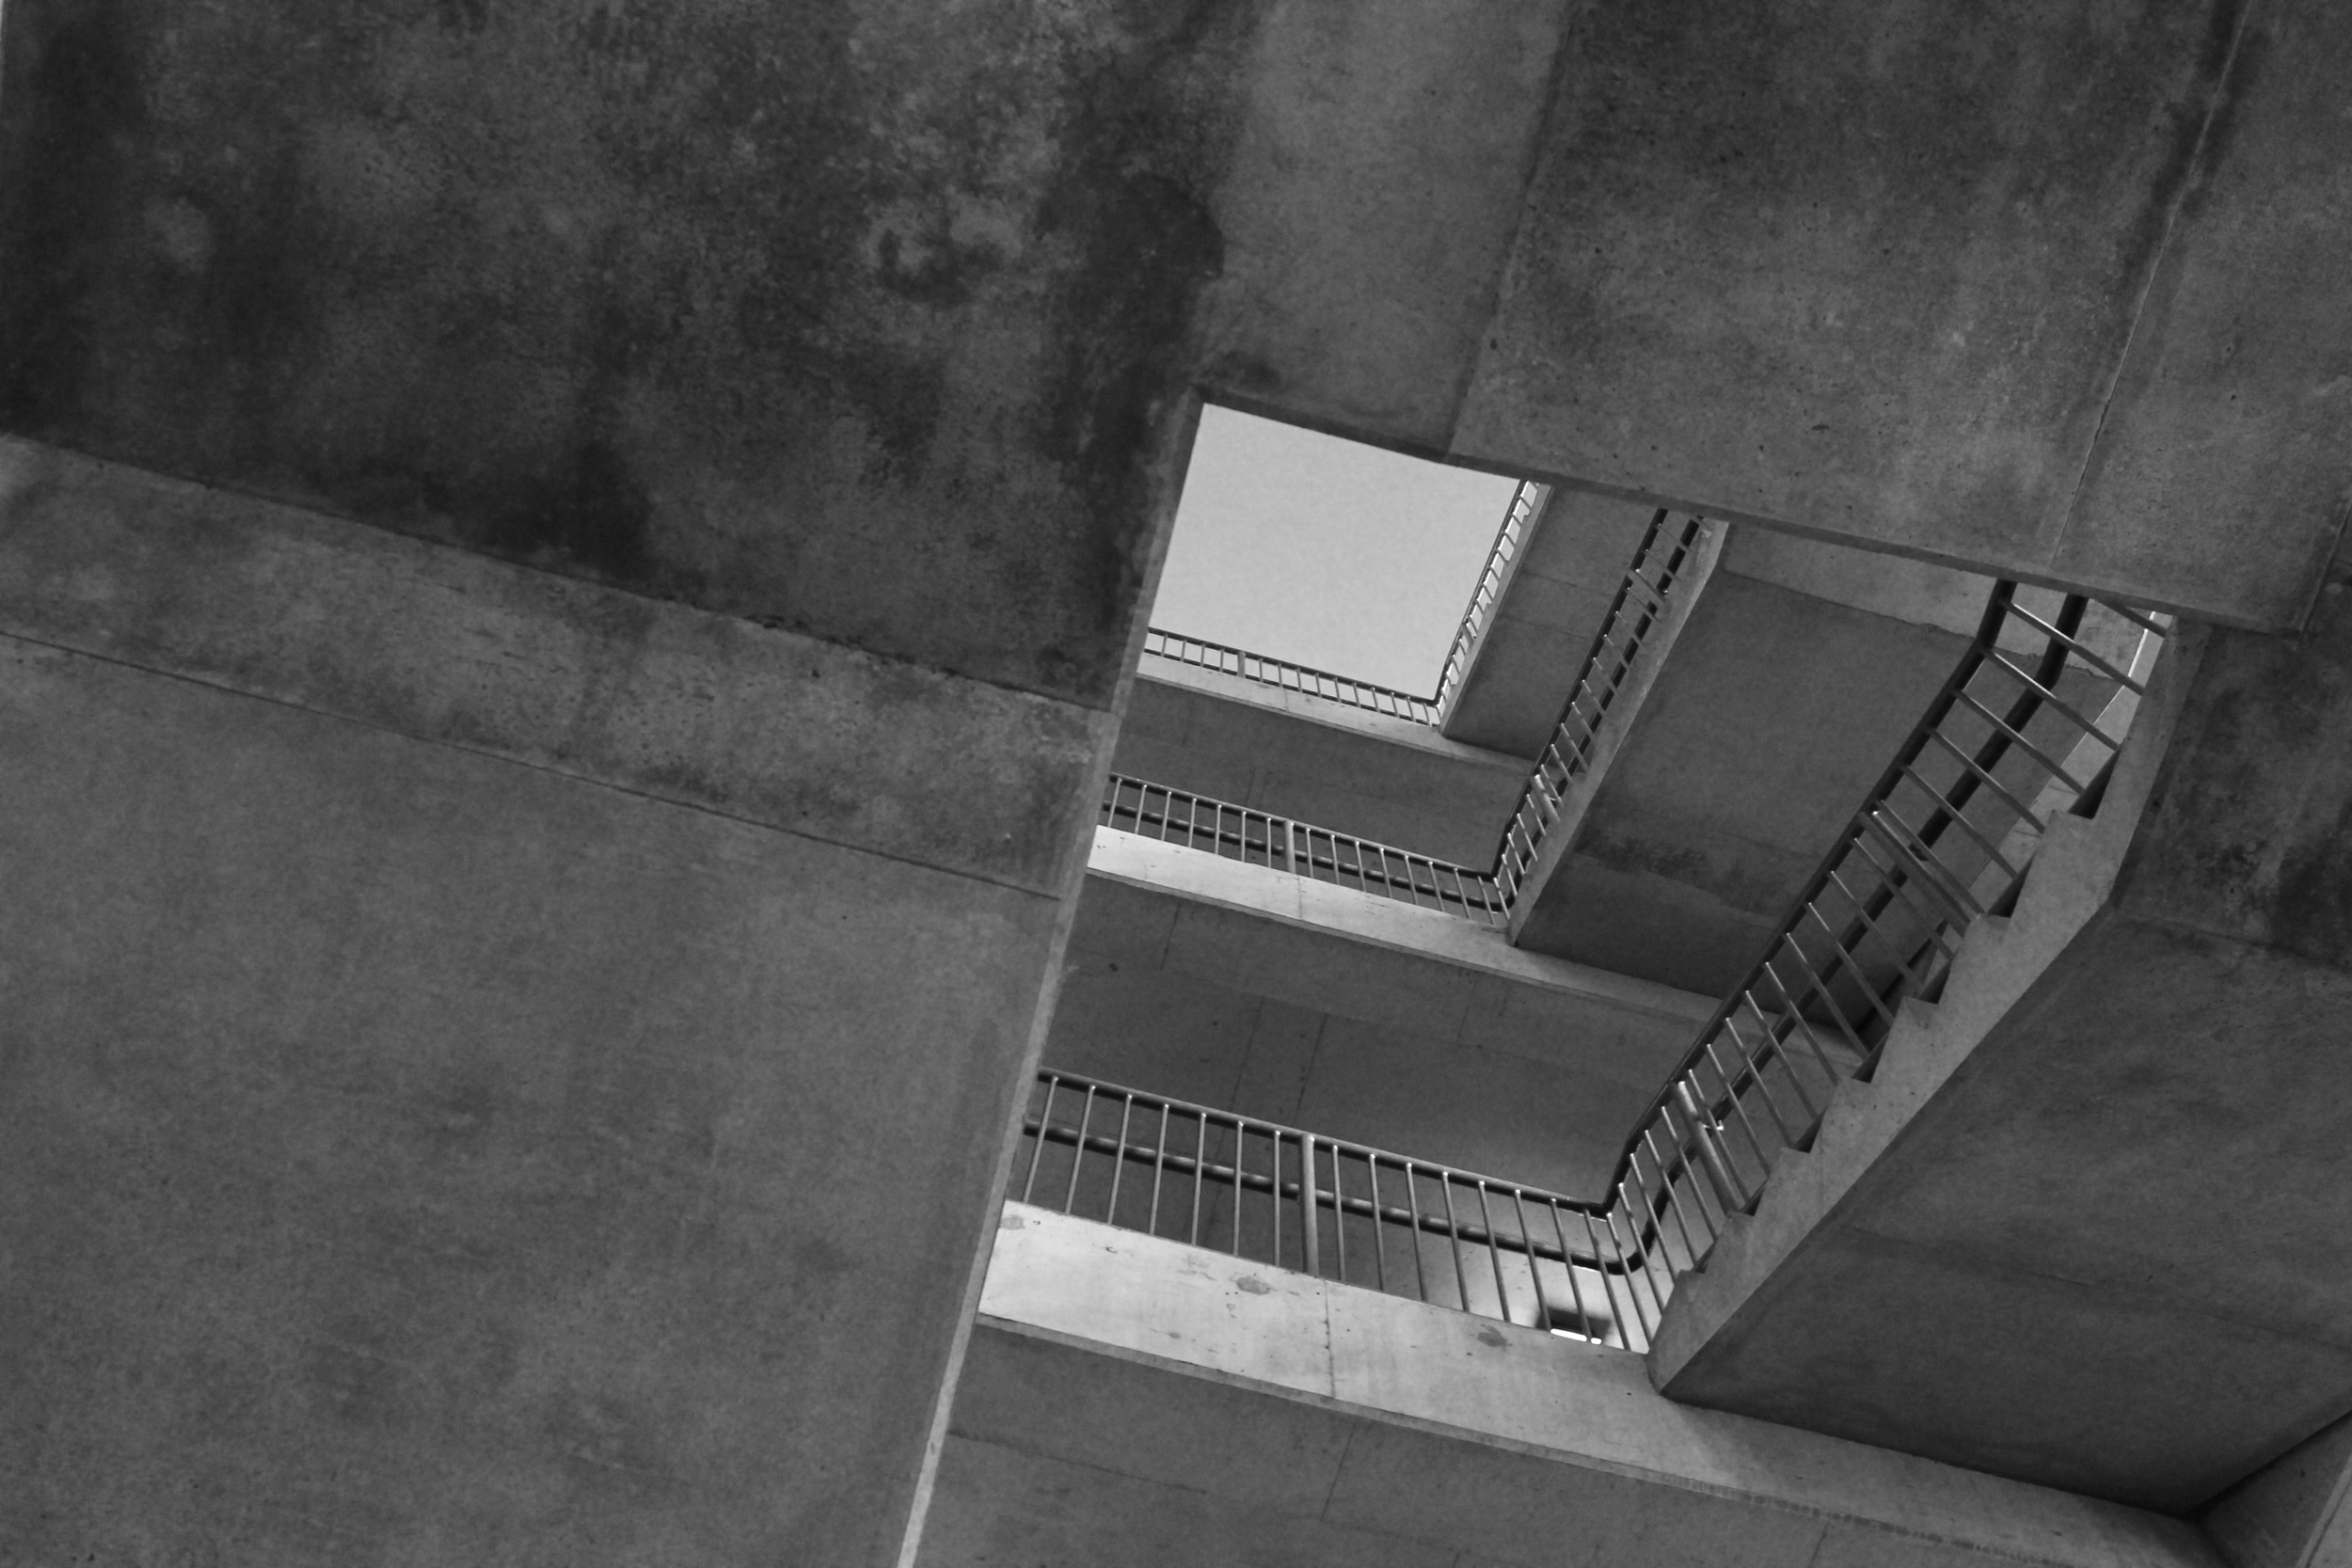 Constructivist Photo 4